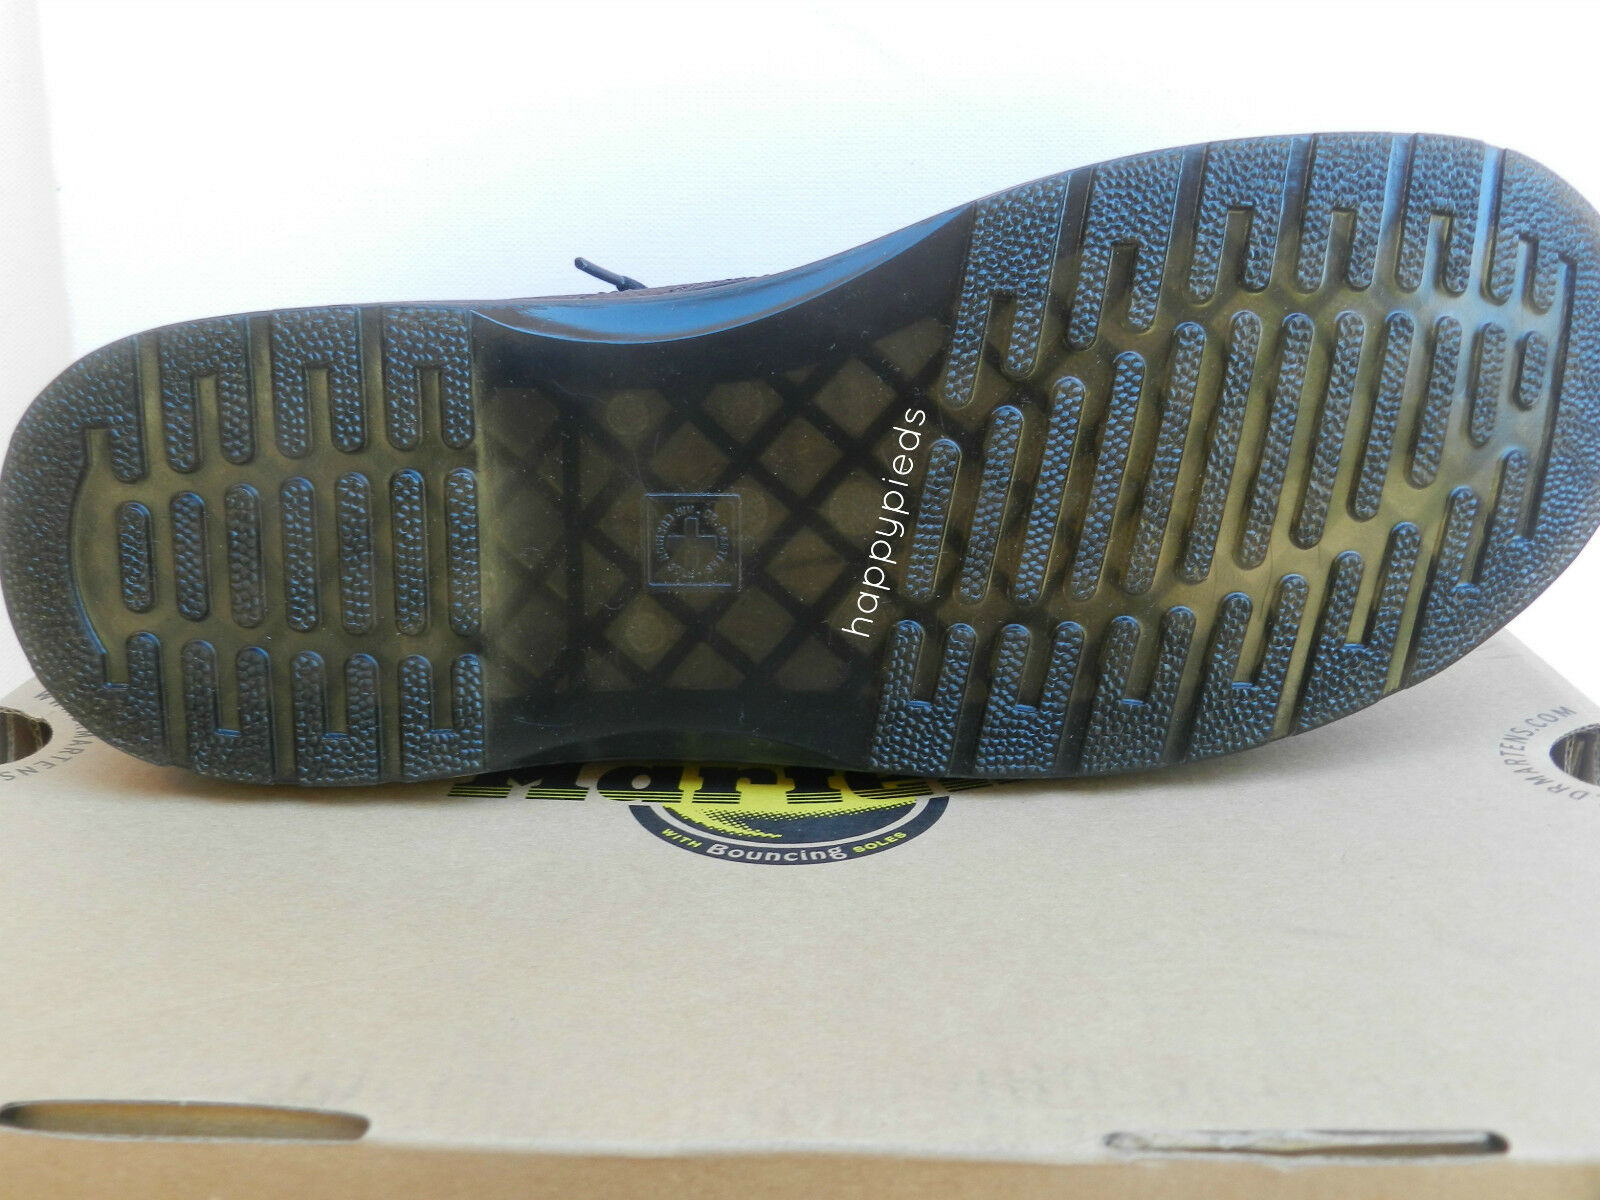 Dr Martens Barnie Chaussures Homme 47 Bottines Chukka Neuf Bottes Montantes UK12 Neuf Chukka 0fcf65